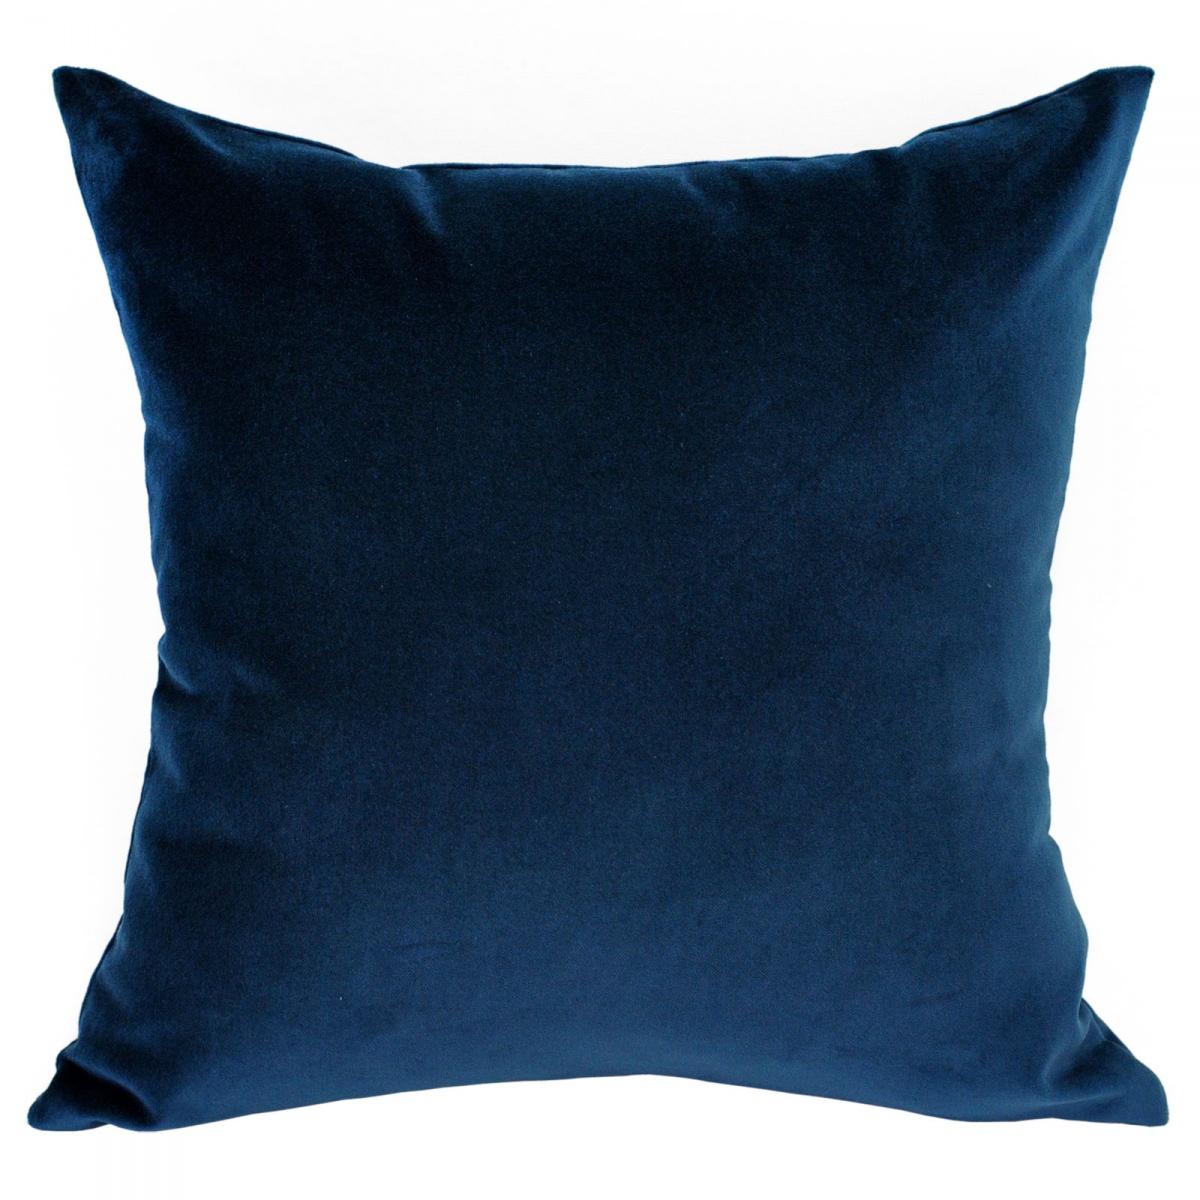 Medium Velvet Navy Cushion 50x50cm Hupper